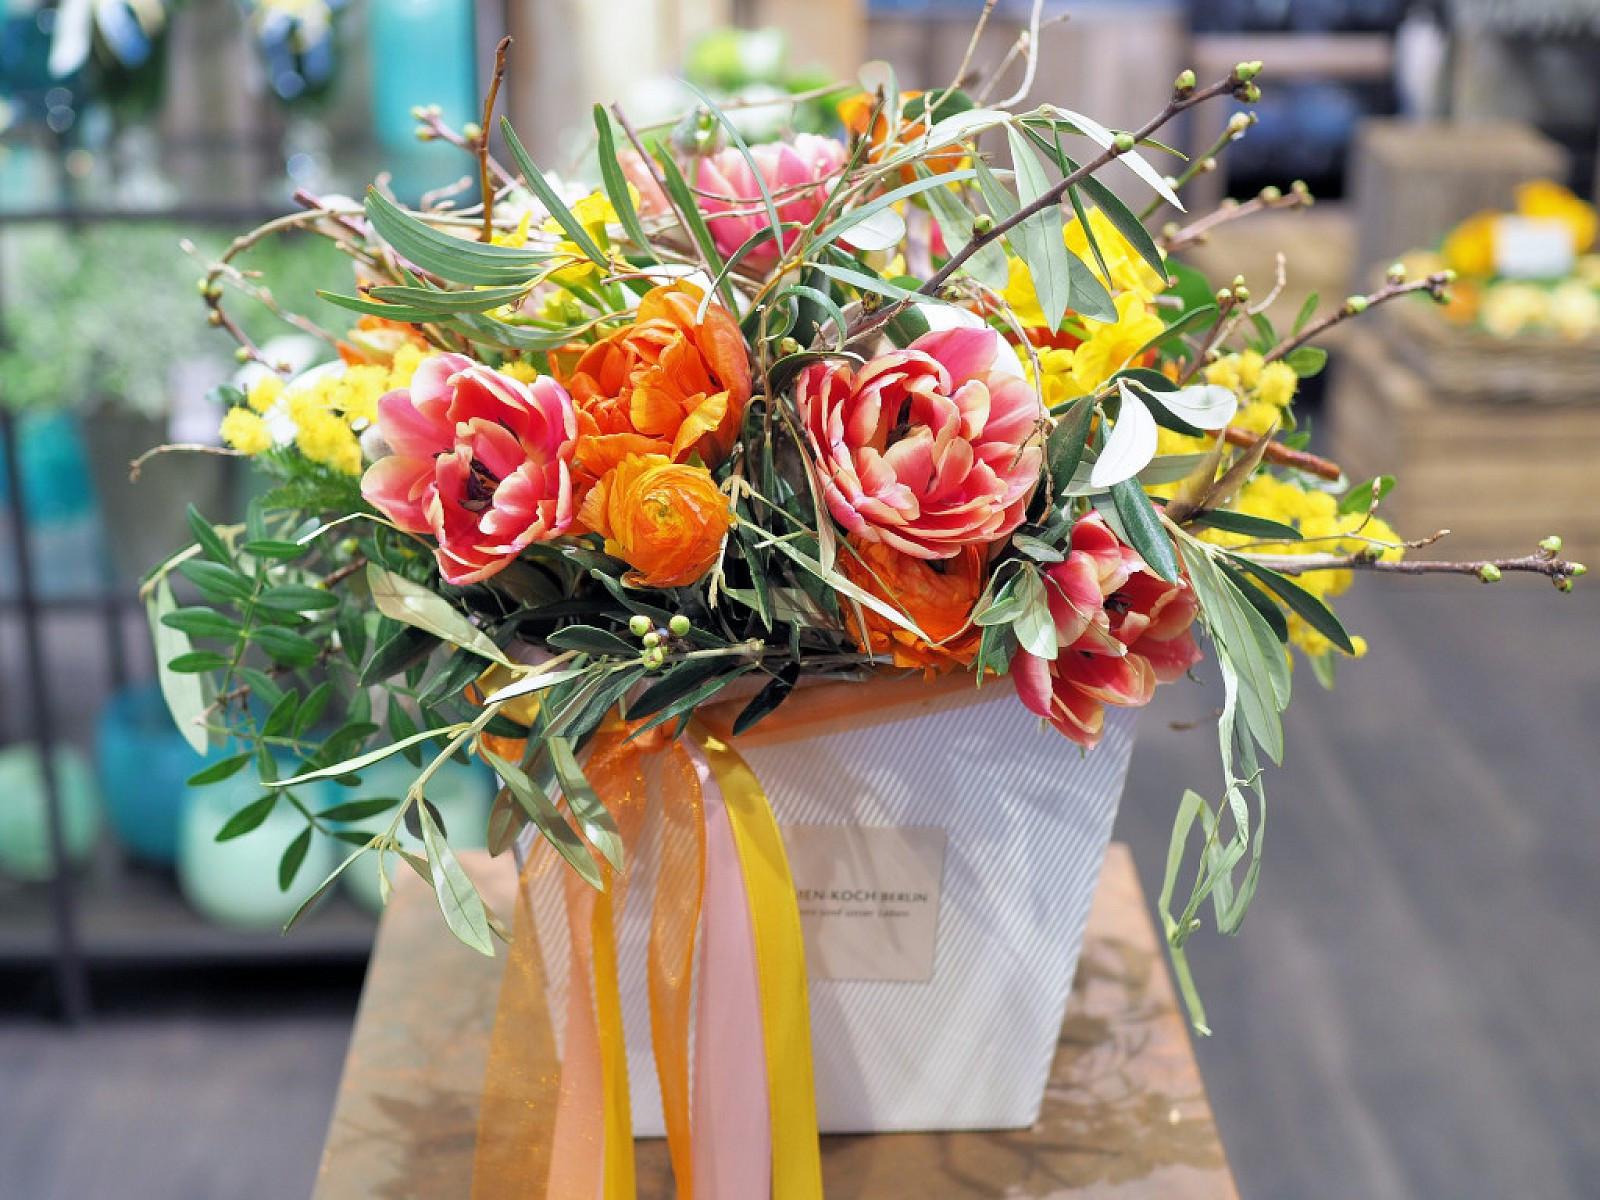 Flower Shop Berlin Berlin floristry Florist Berlin Flowers Gallery Wedding floristry flower delivery